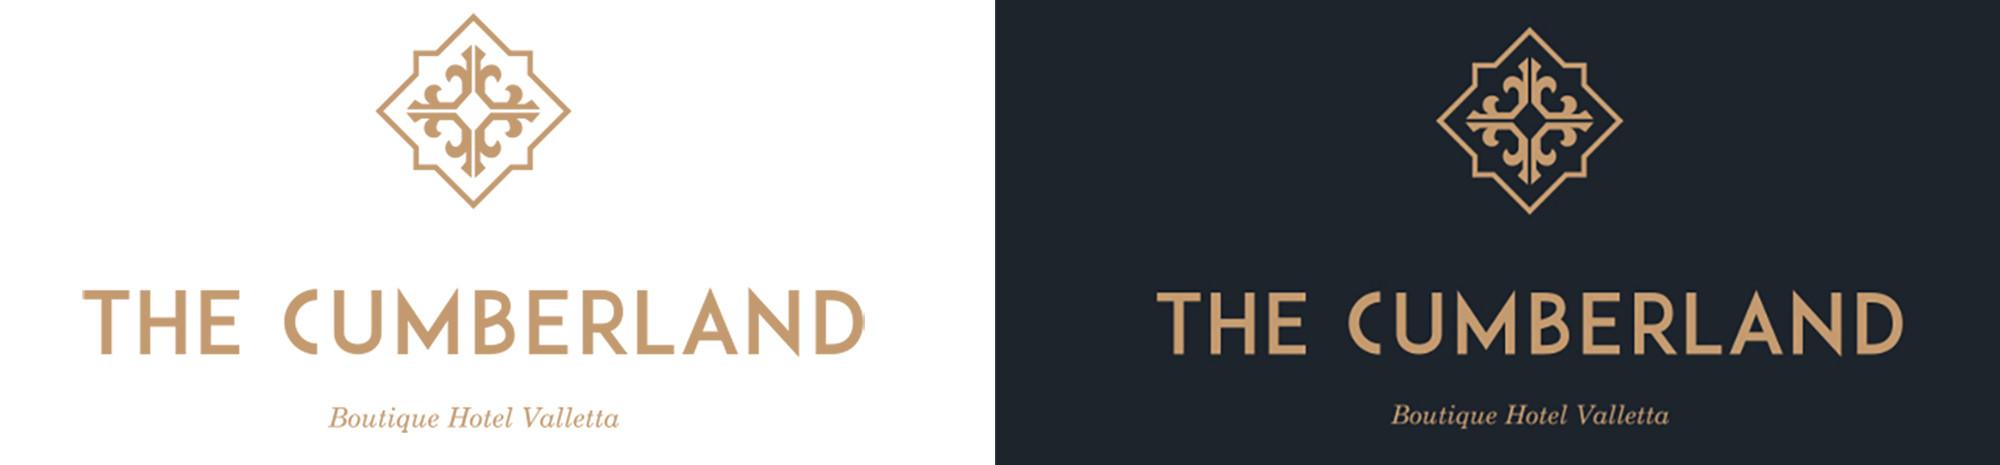 the-cumberland-moodboard-4